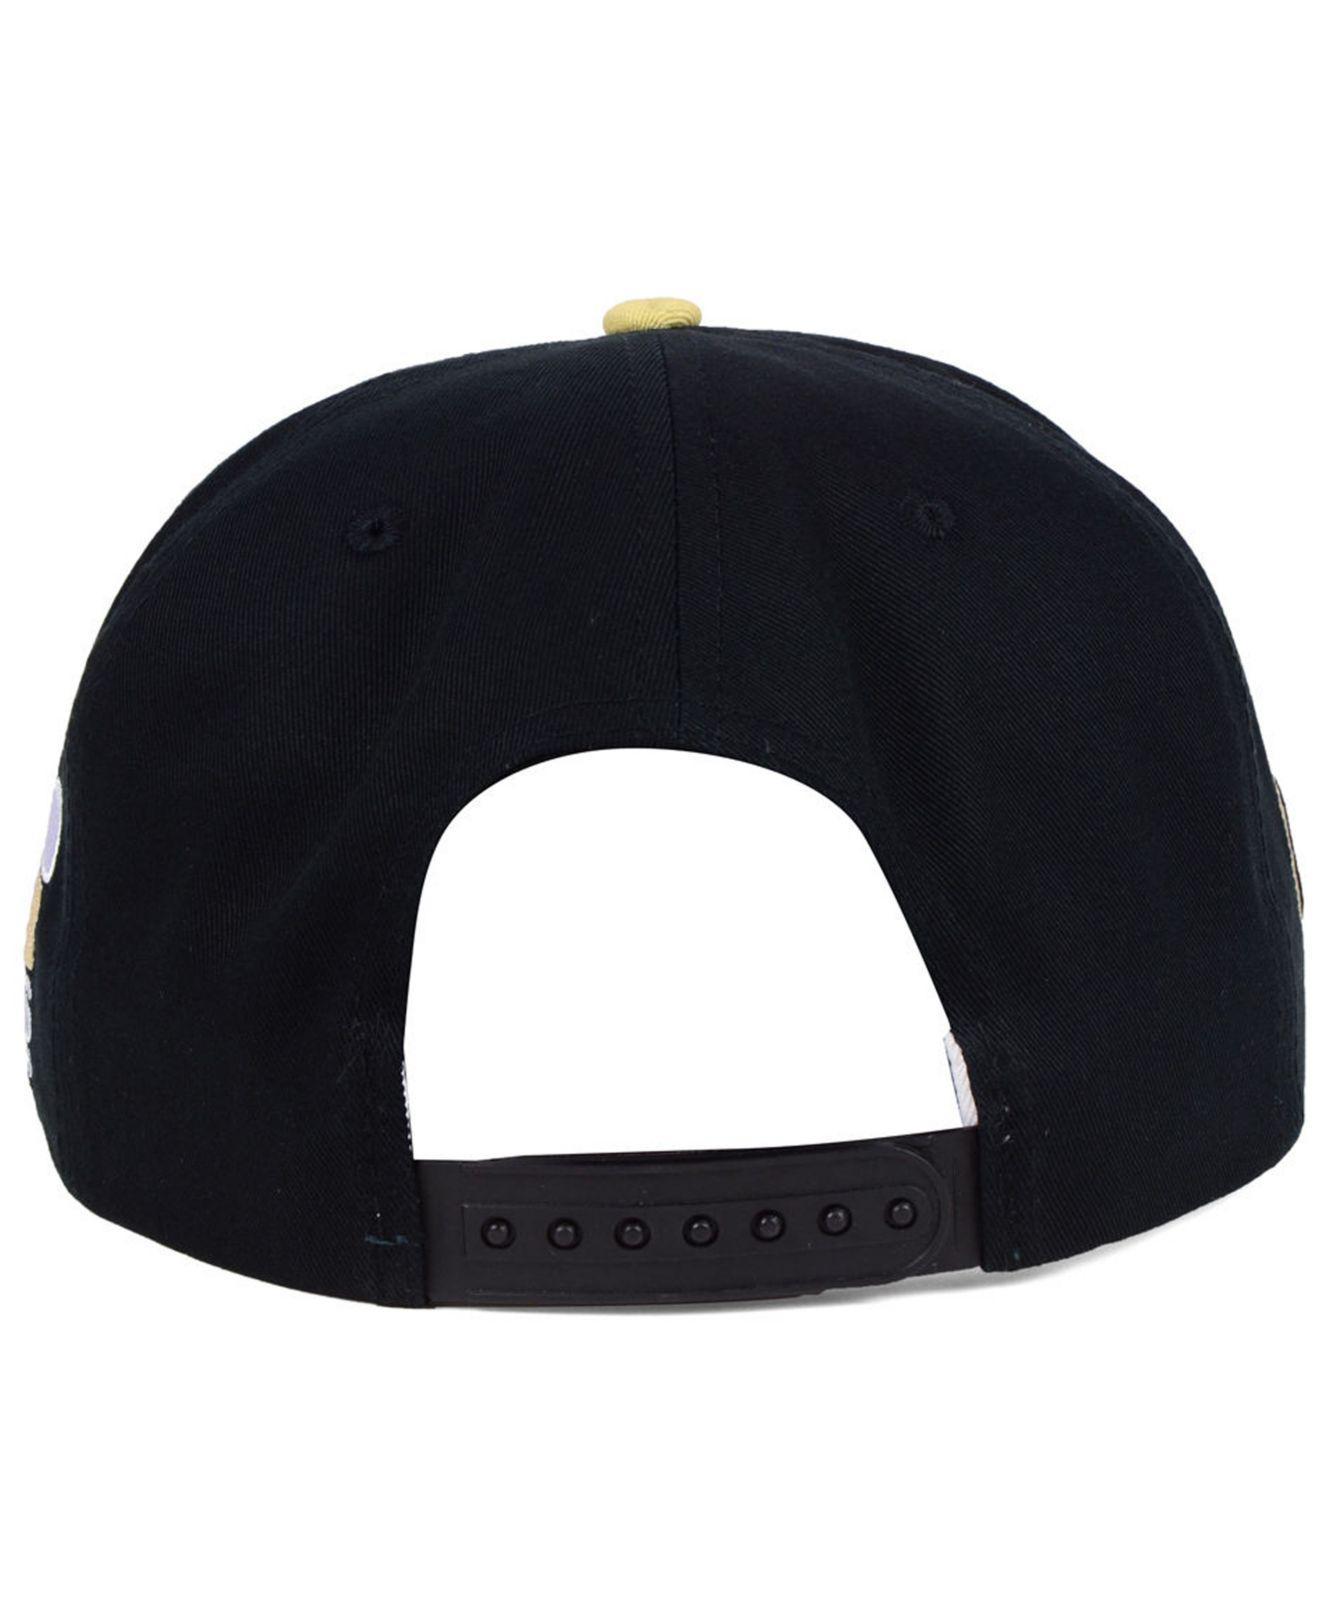 4f55d53bc2c Nike - Black Colorado Buffaloes Sport Specialties Snapback Cap for Men -  Lyst. View fullscreen